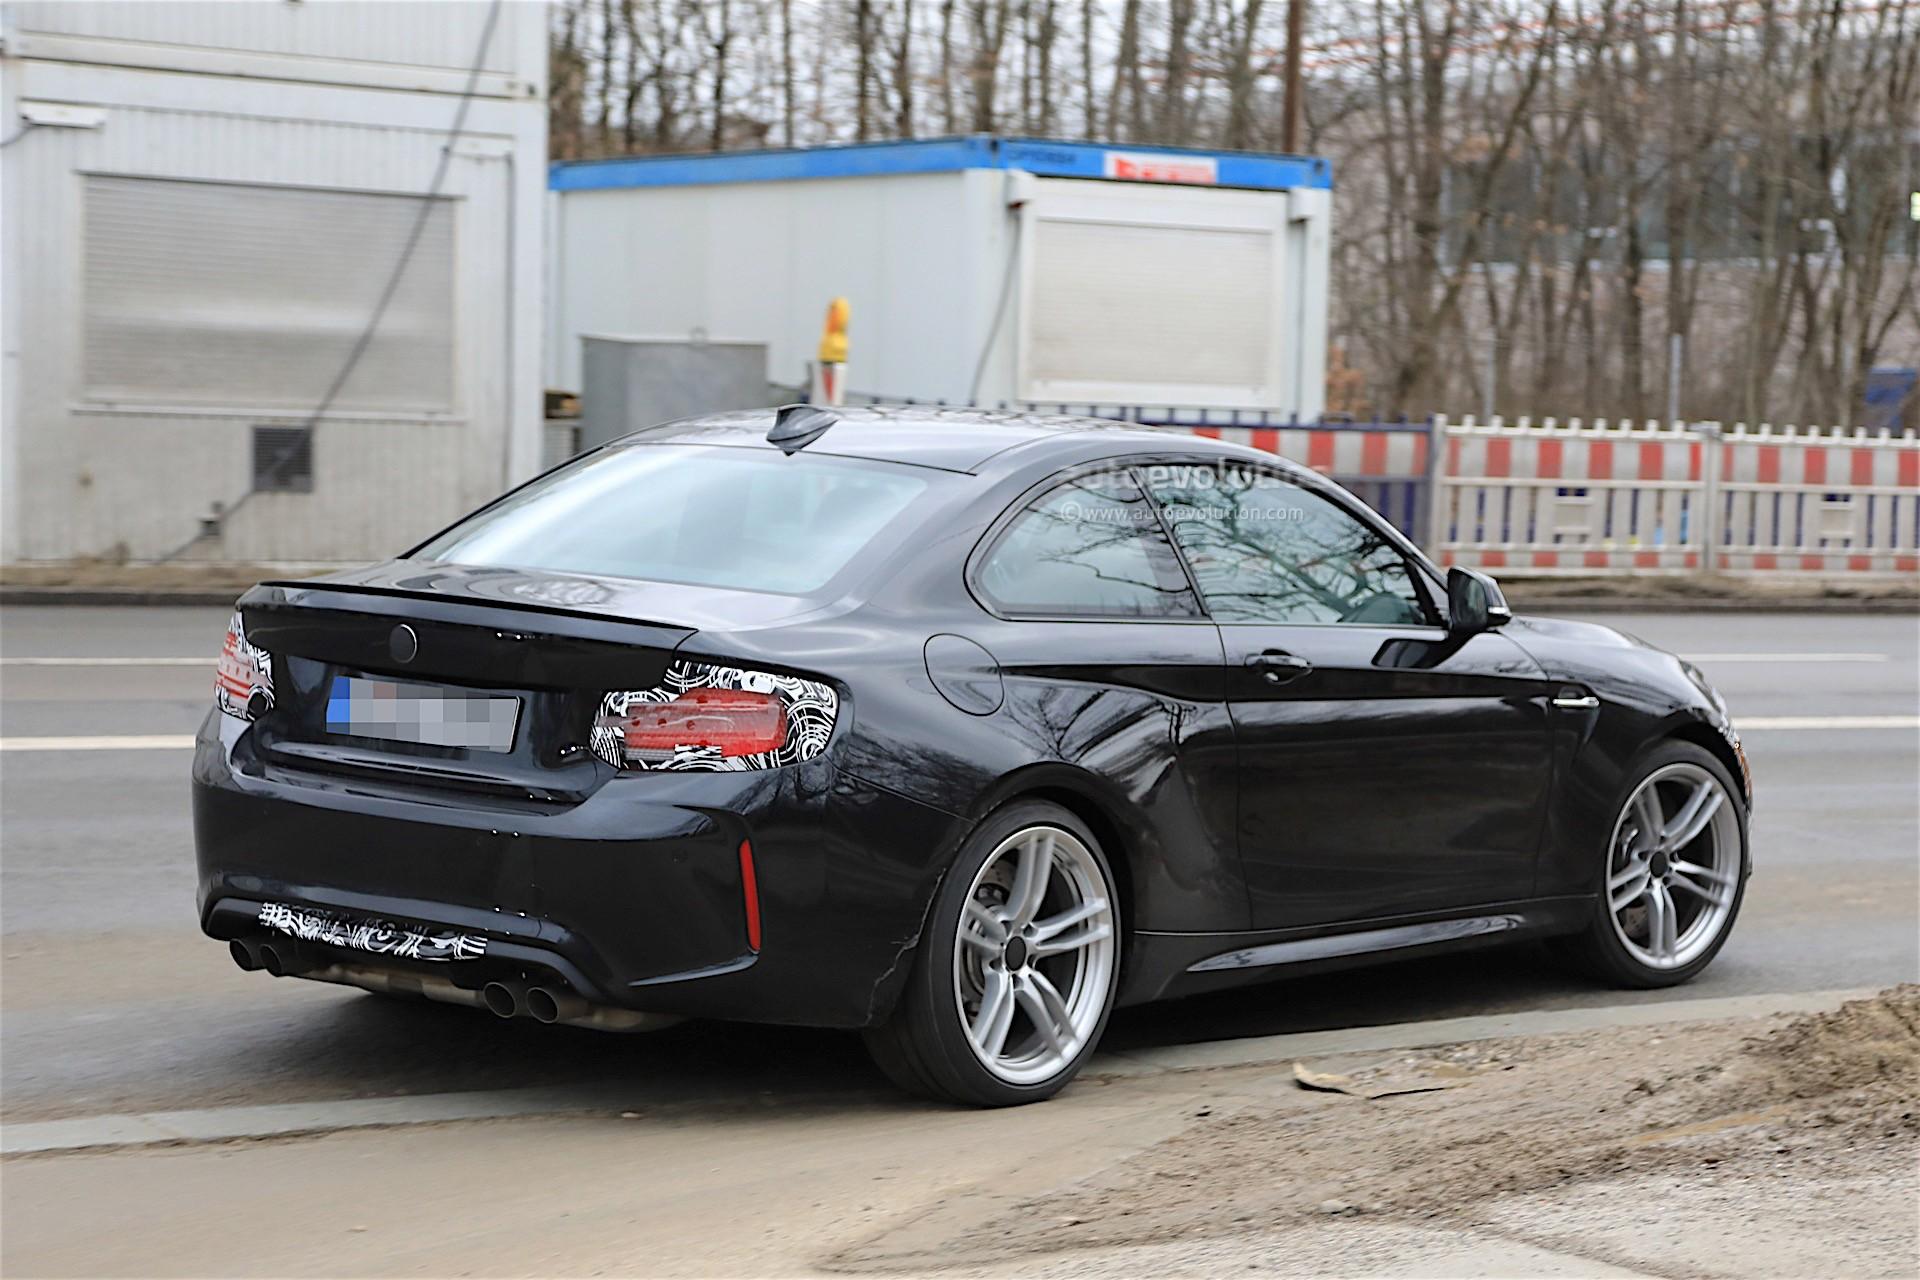 Bmw 2002 Turbo >> 2018 BMW M2 CS Spotted Winter Testing With M3 Engine - autoevolution